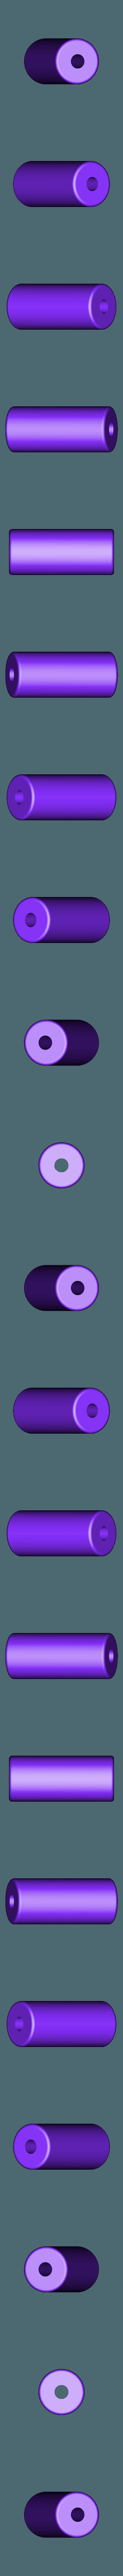 Spacer-19.STL Download free STL file Automata-4 Ben rides around the clock • 3D printer template, woodenclocks